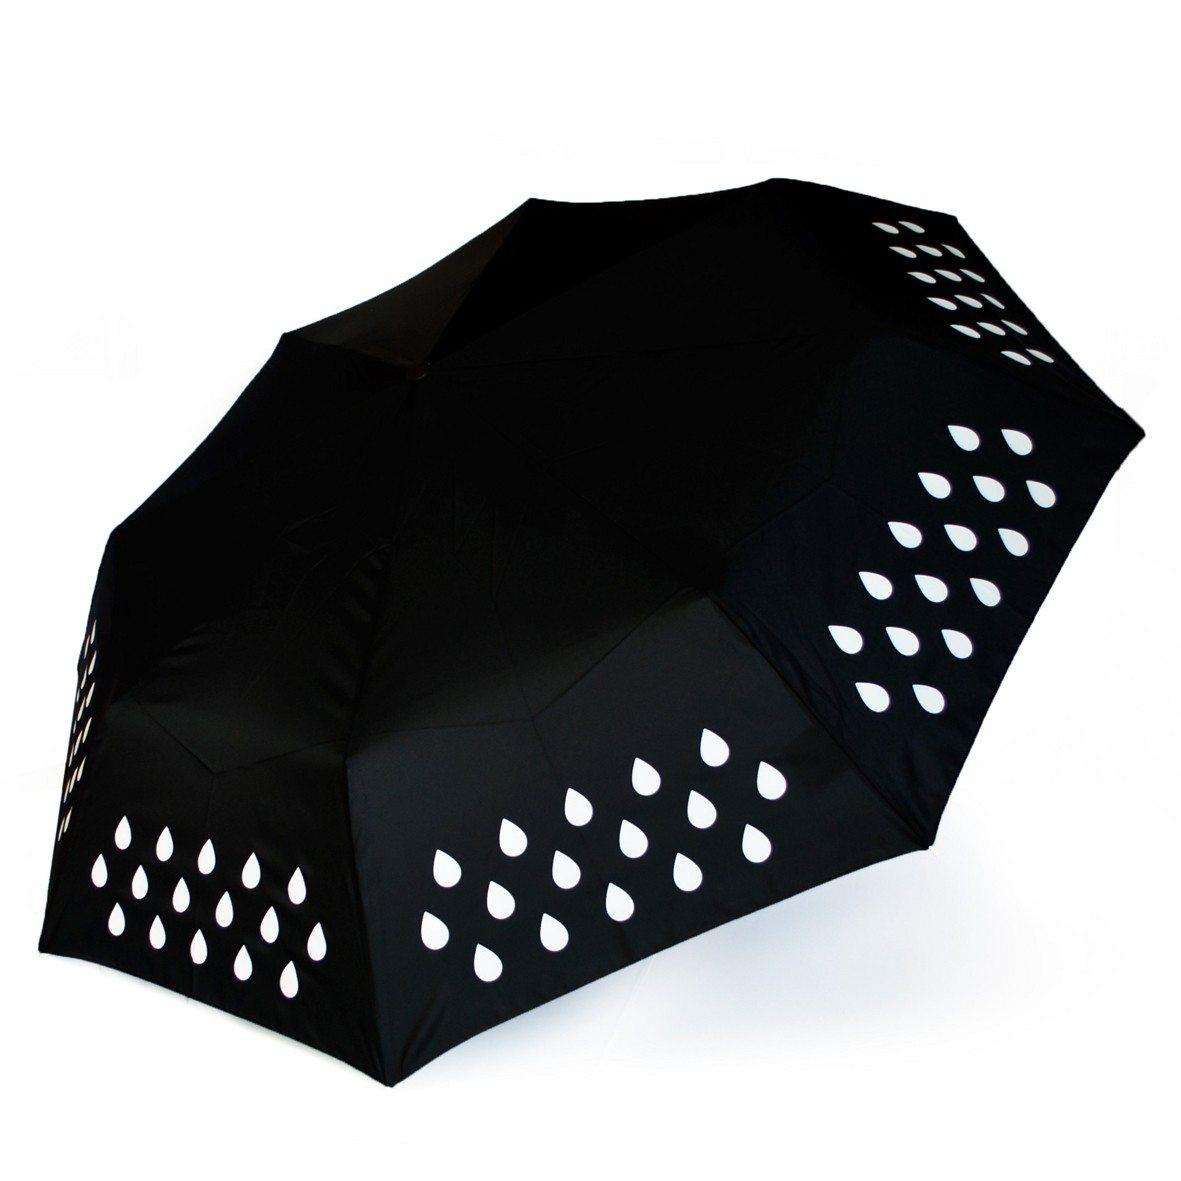 Van kleur wisselende paraplu